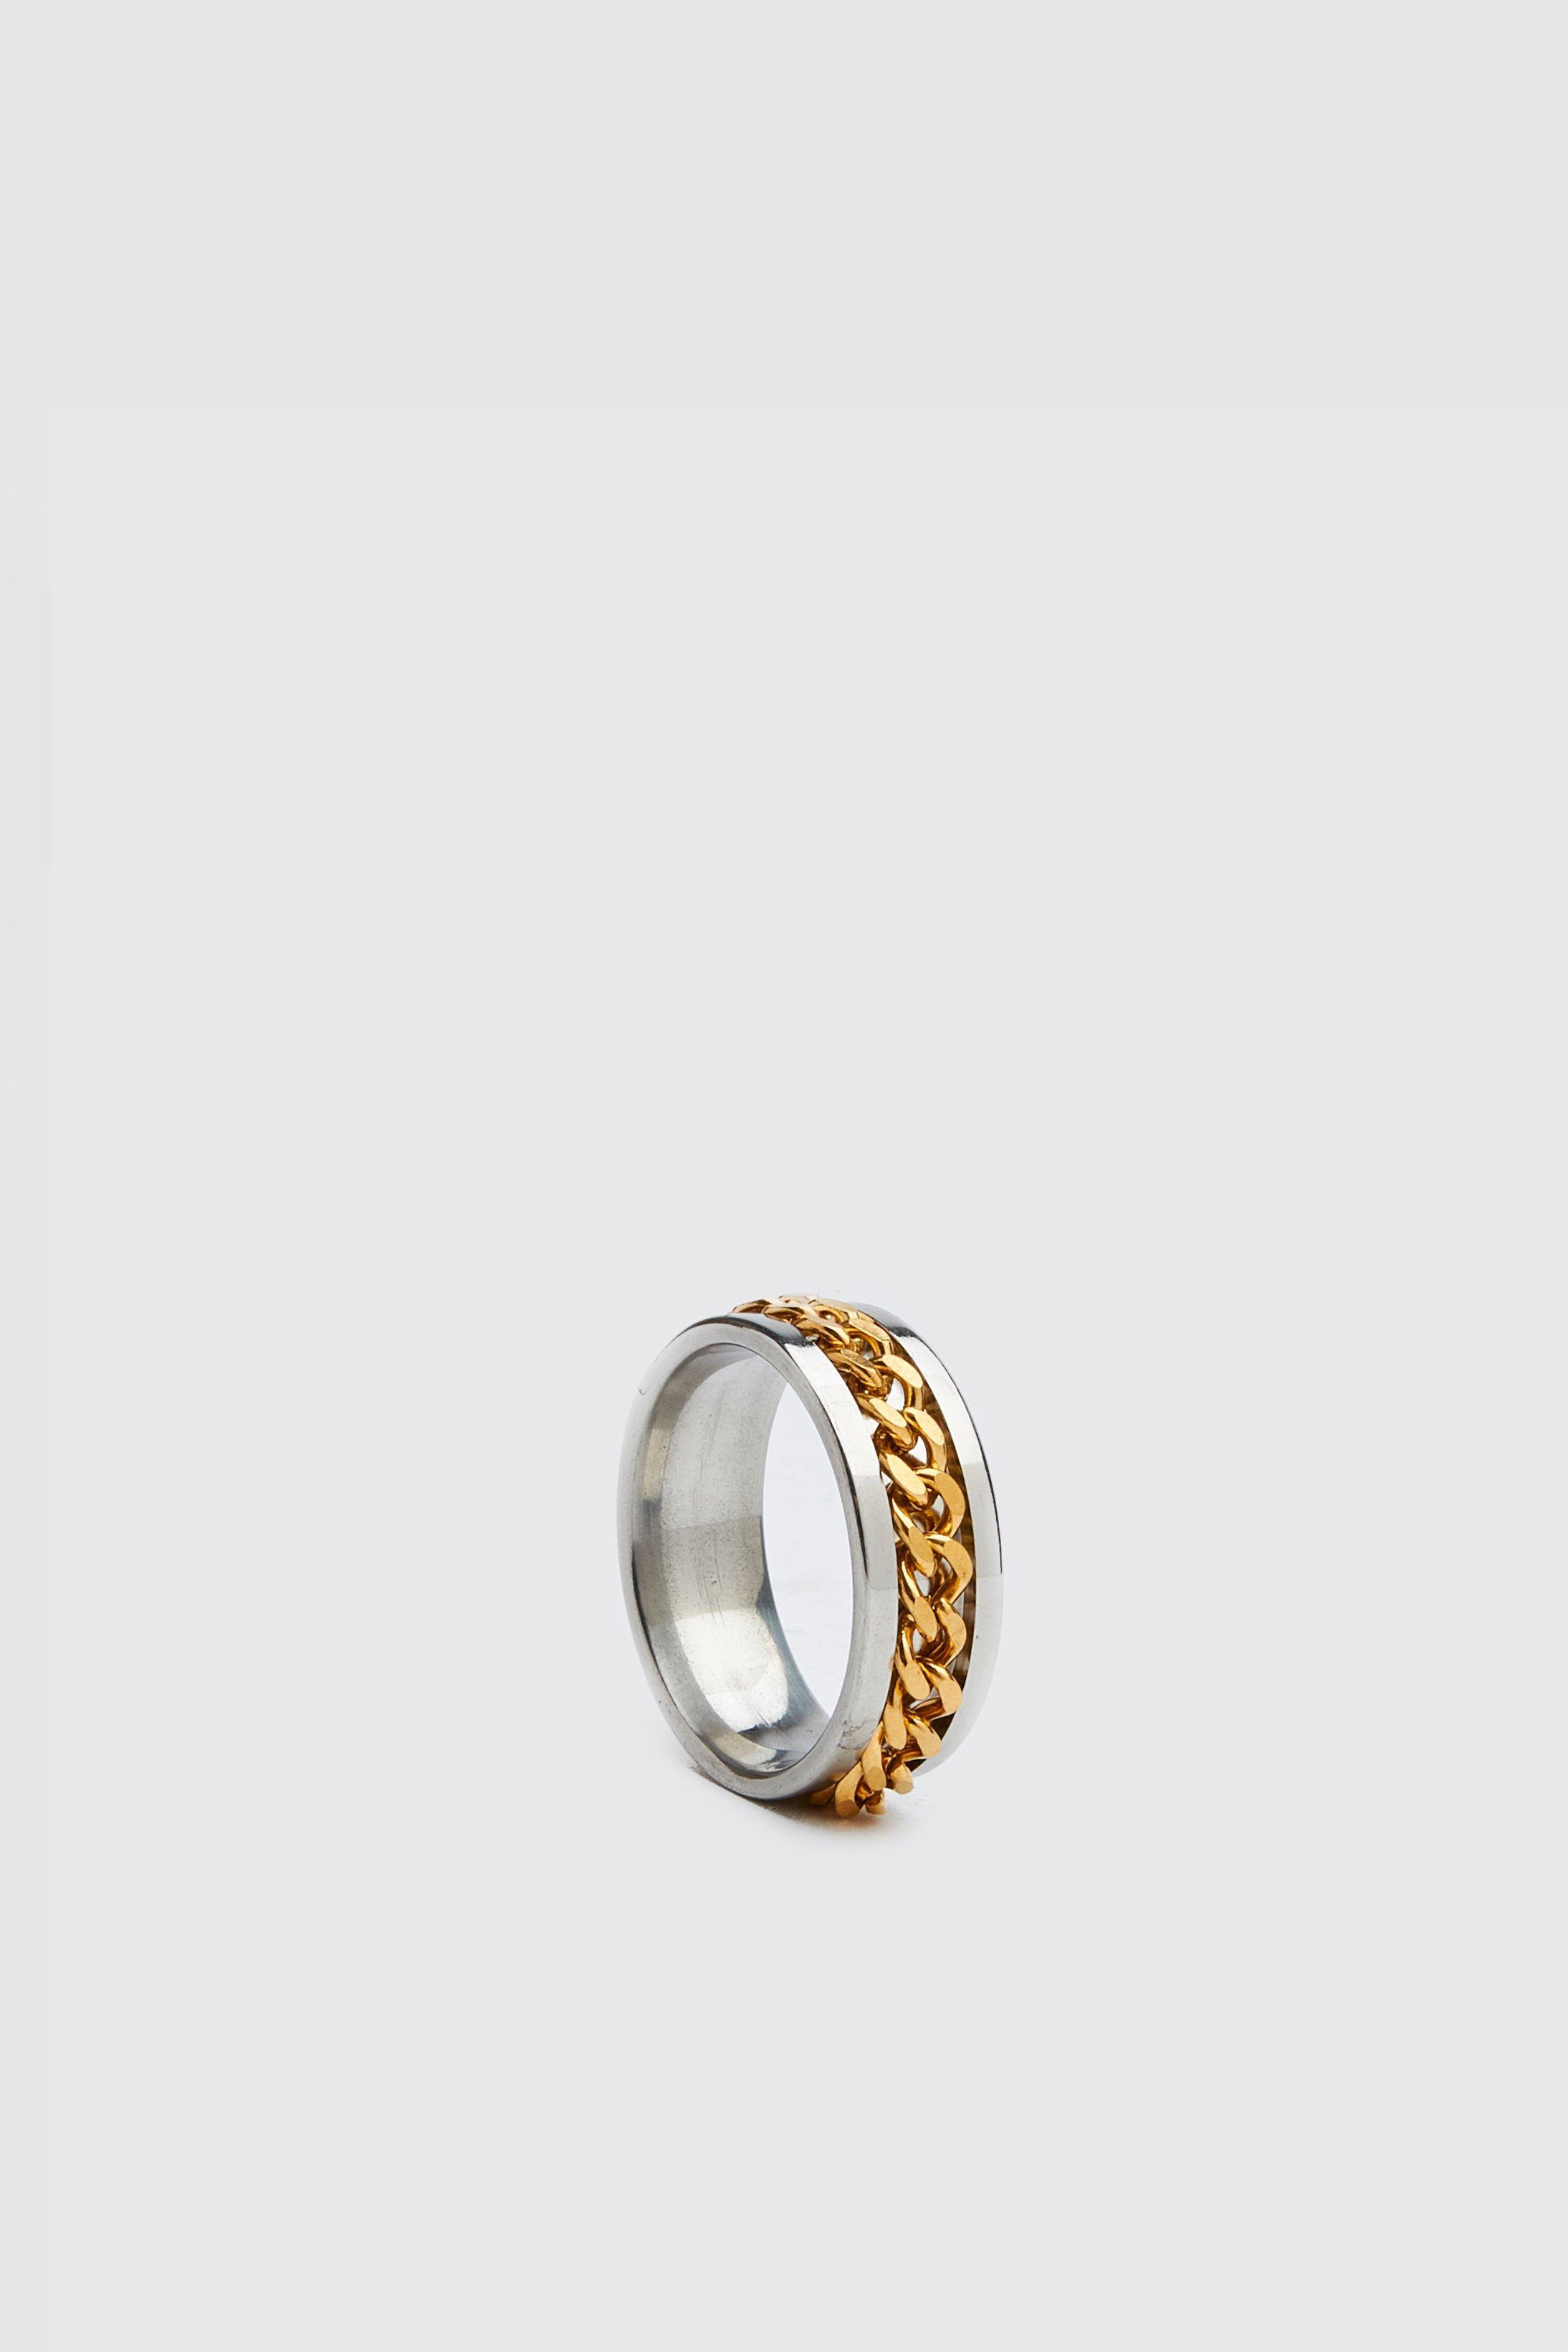 Chain Detail Ring Boohoo Uk